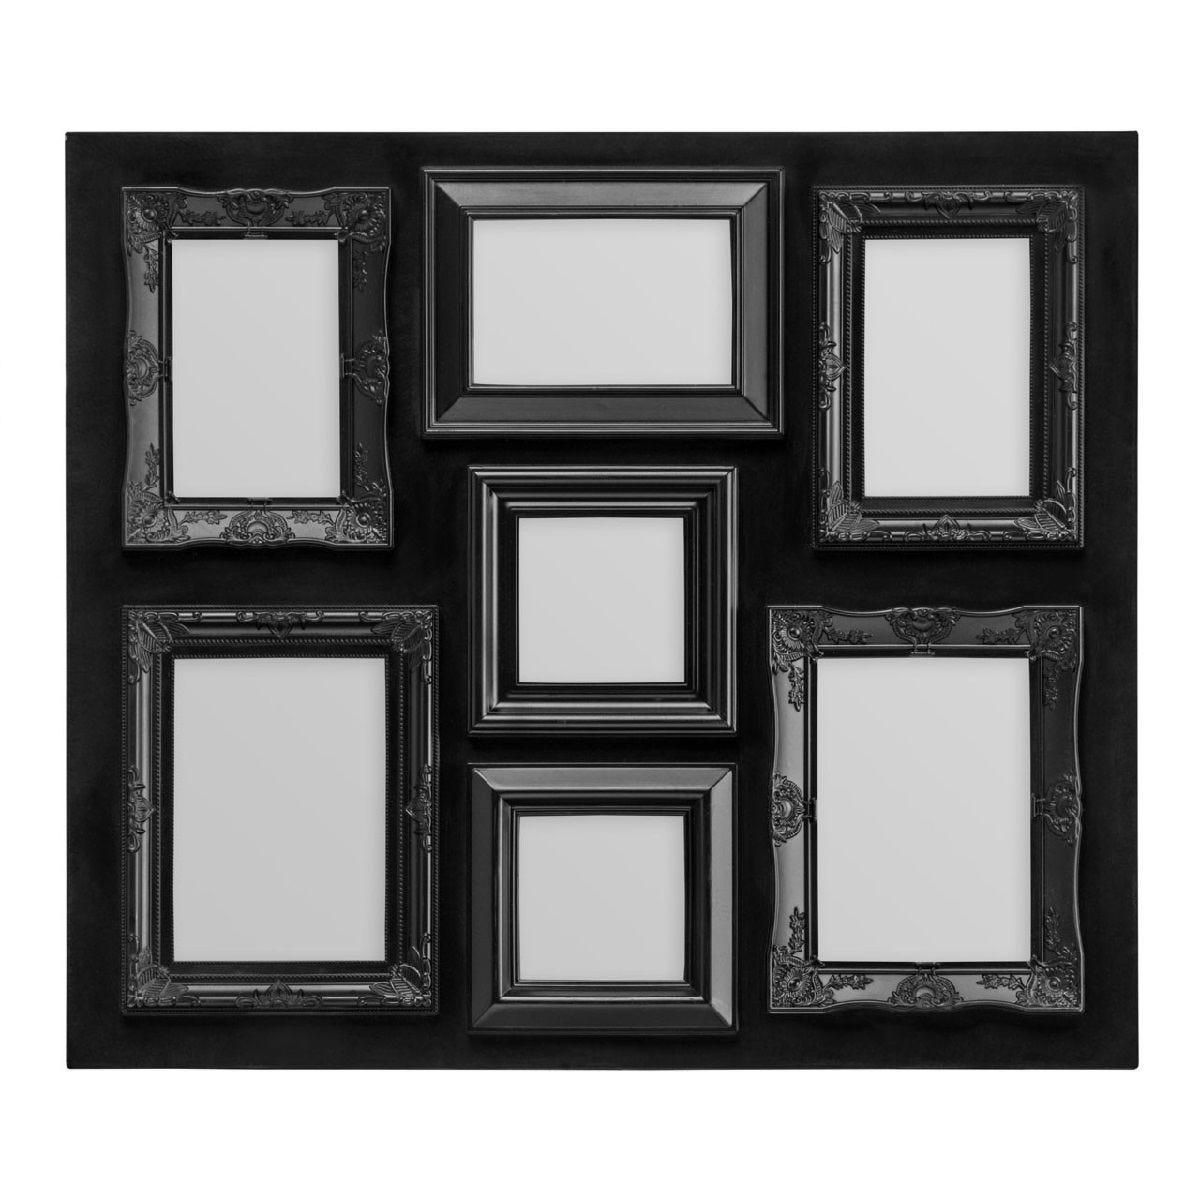 Premier Housewares Multi Photo Frame, 7 Photo Black Plastic Frame - 5 Rectangular, 1 Square